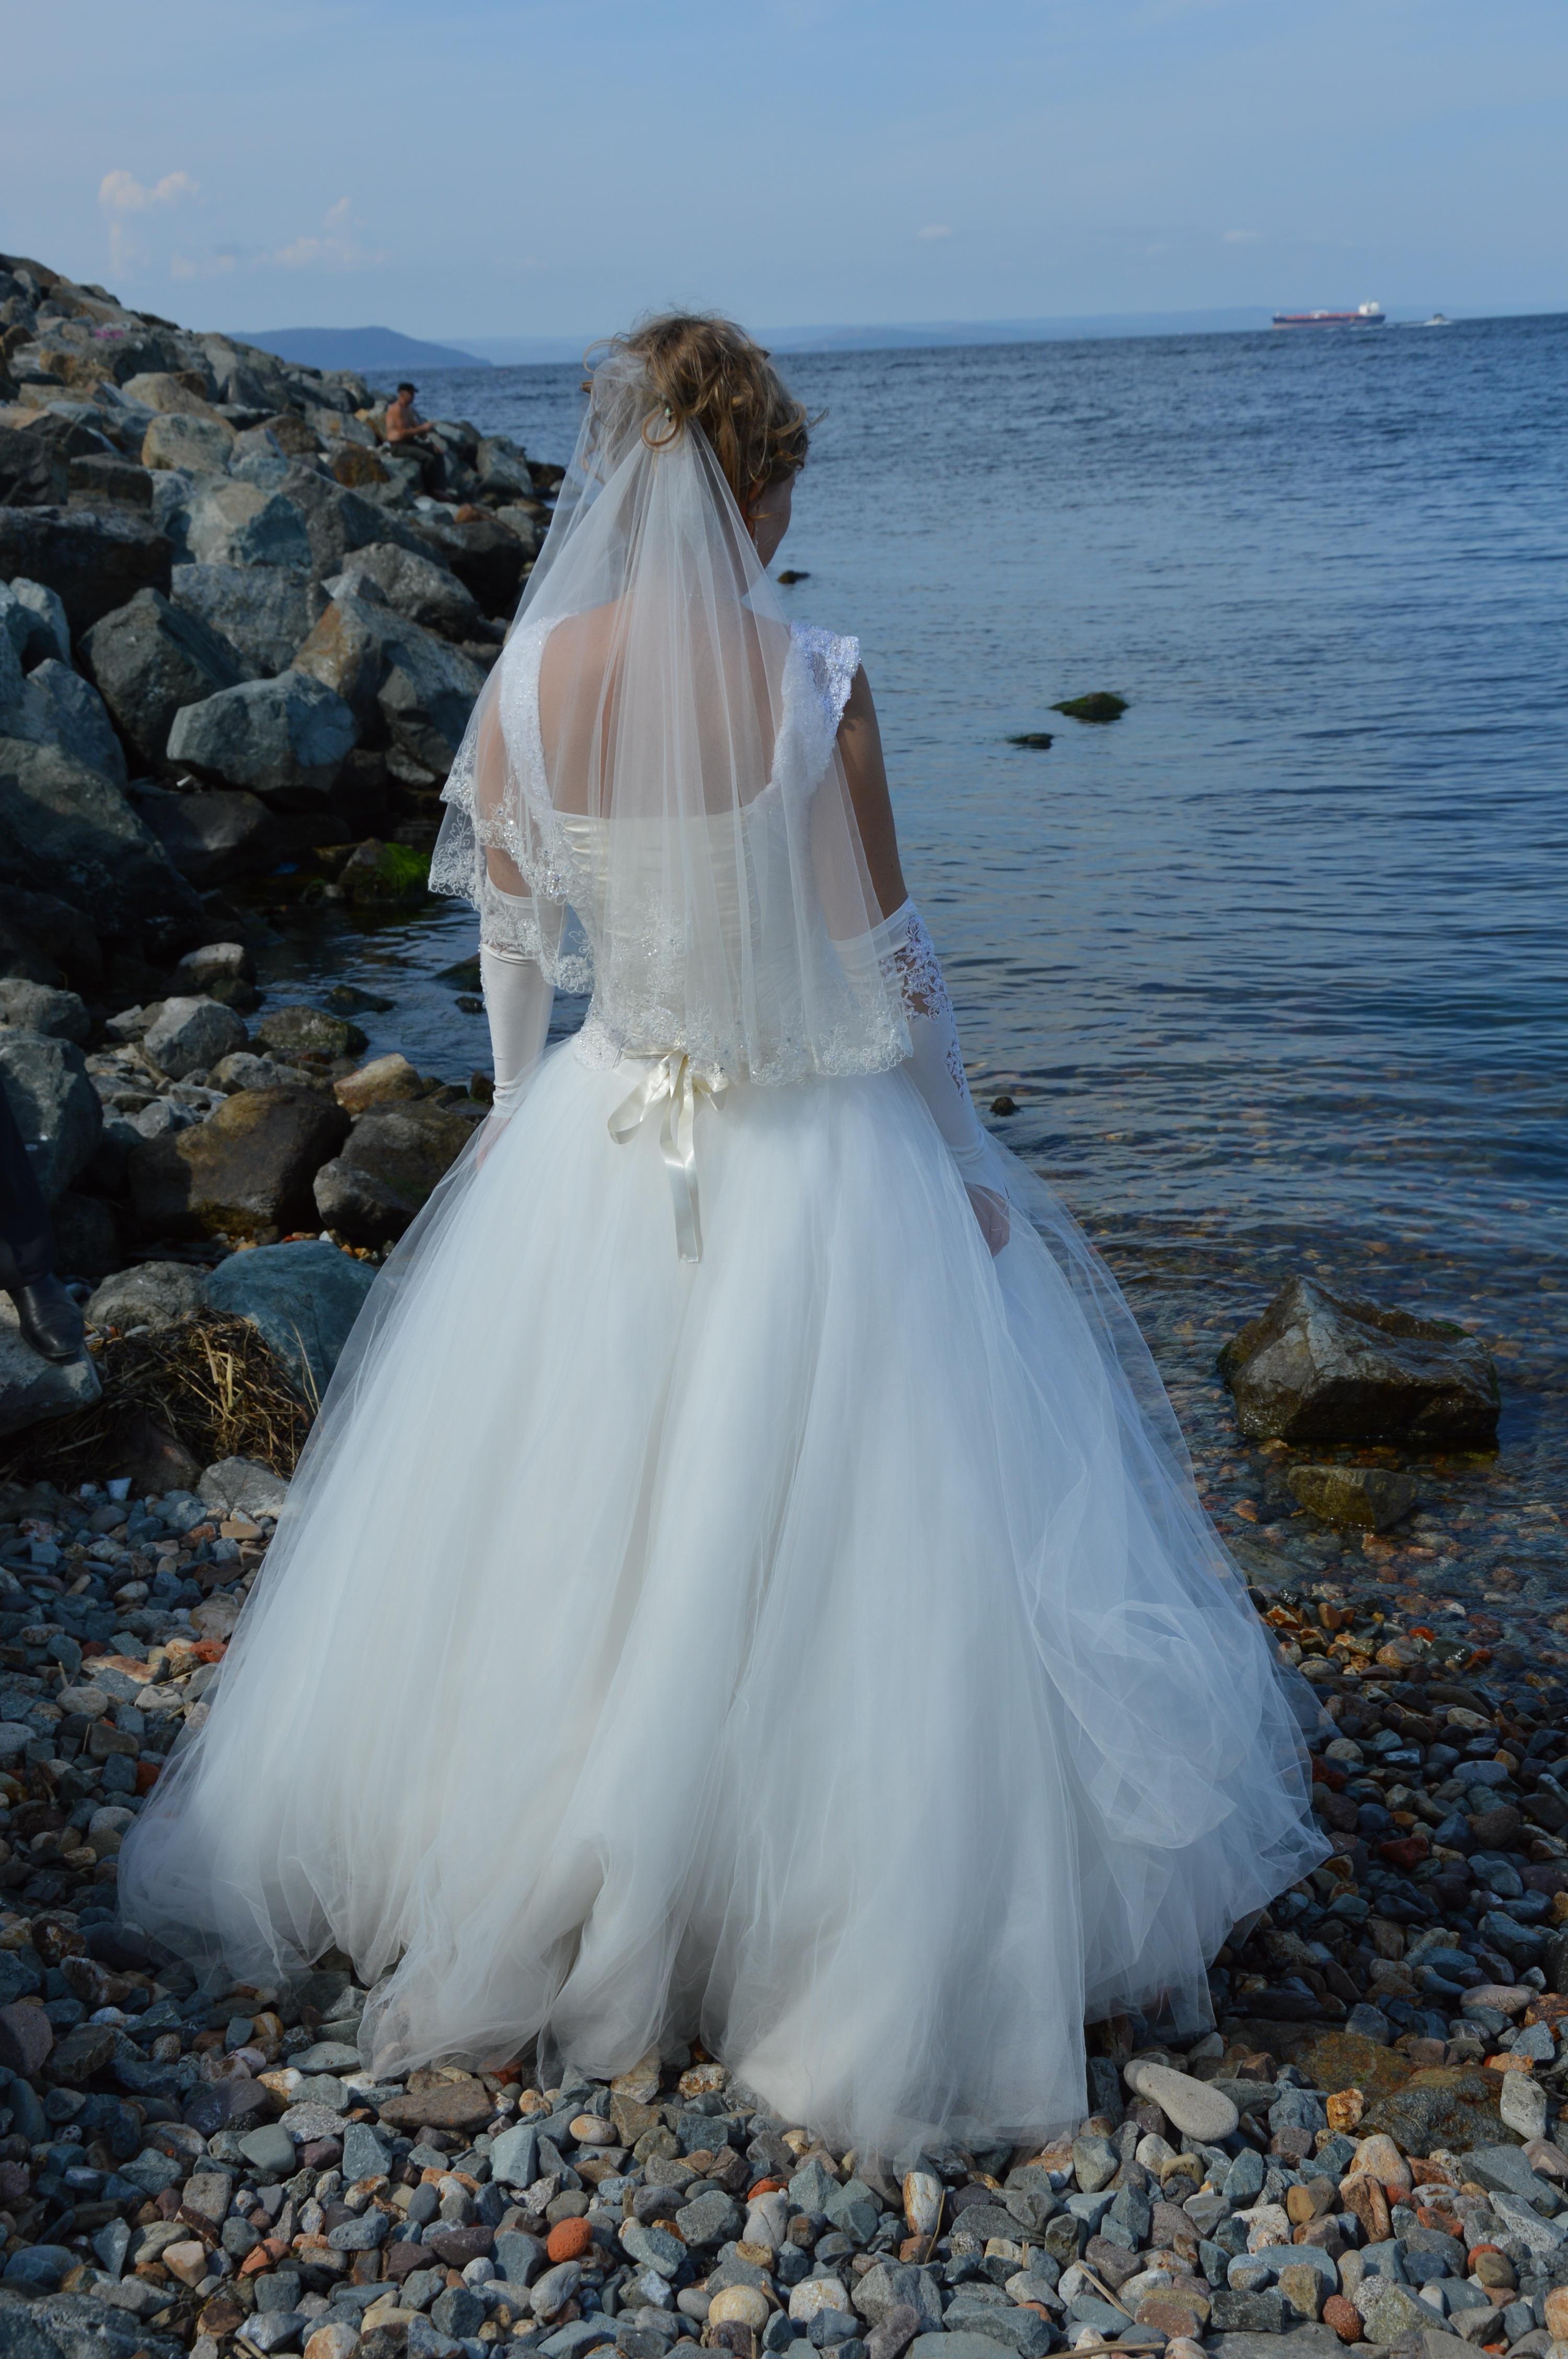 Free Images : sea, nature, woman, blue, wedding dress, bride, white ...